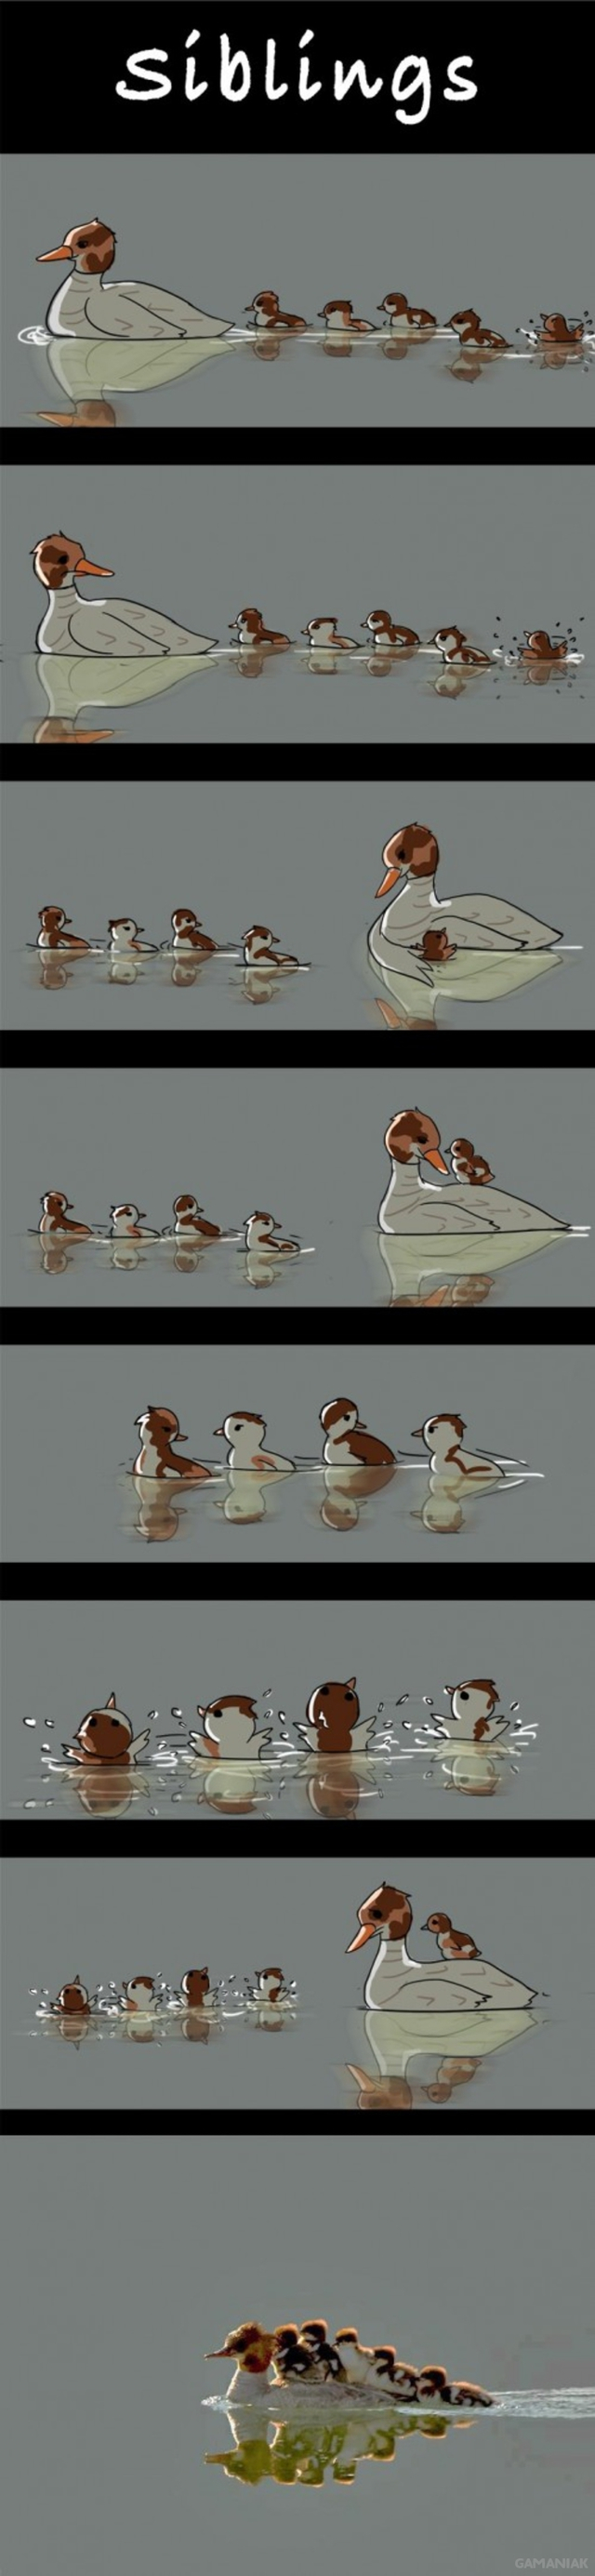 jalousie-freres-soeurs-illustree-canards